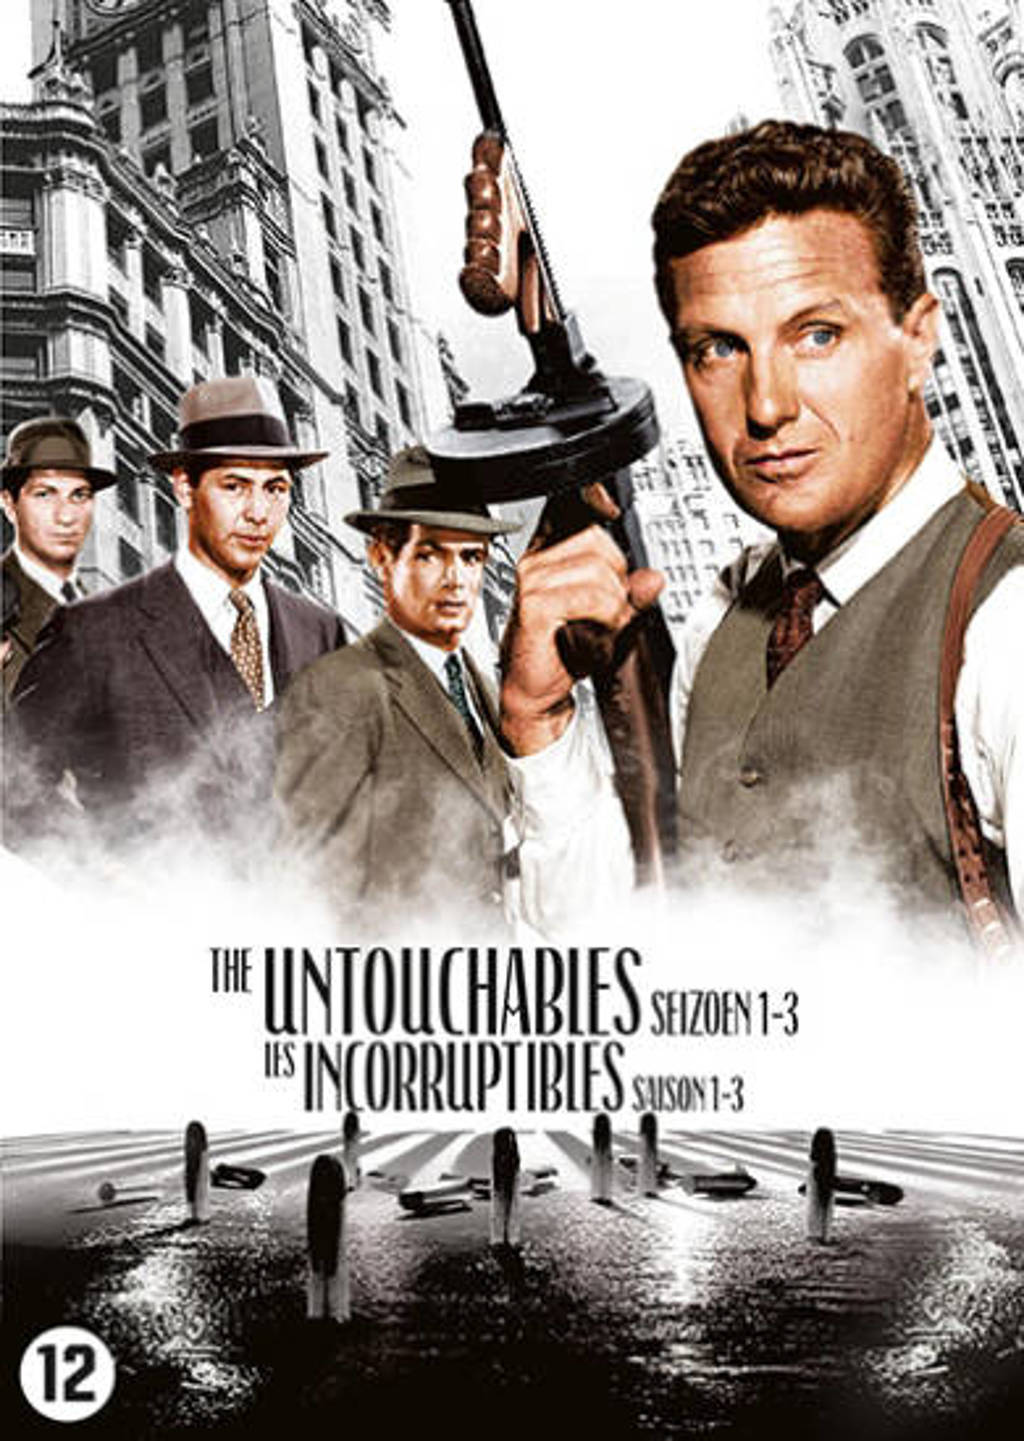 Untouchables - Seizoen 1-3 (DVD)